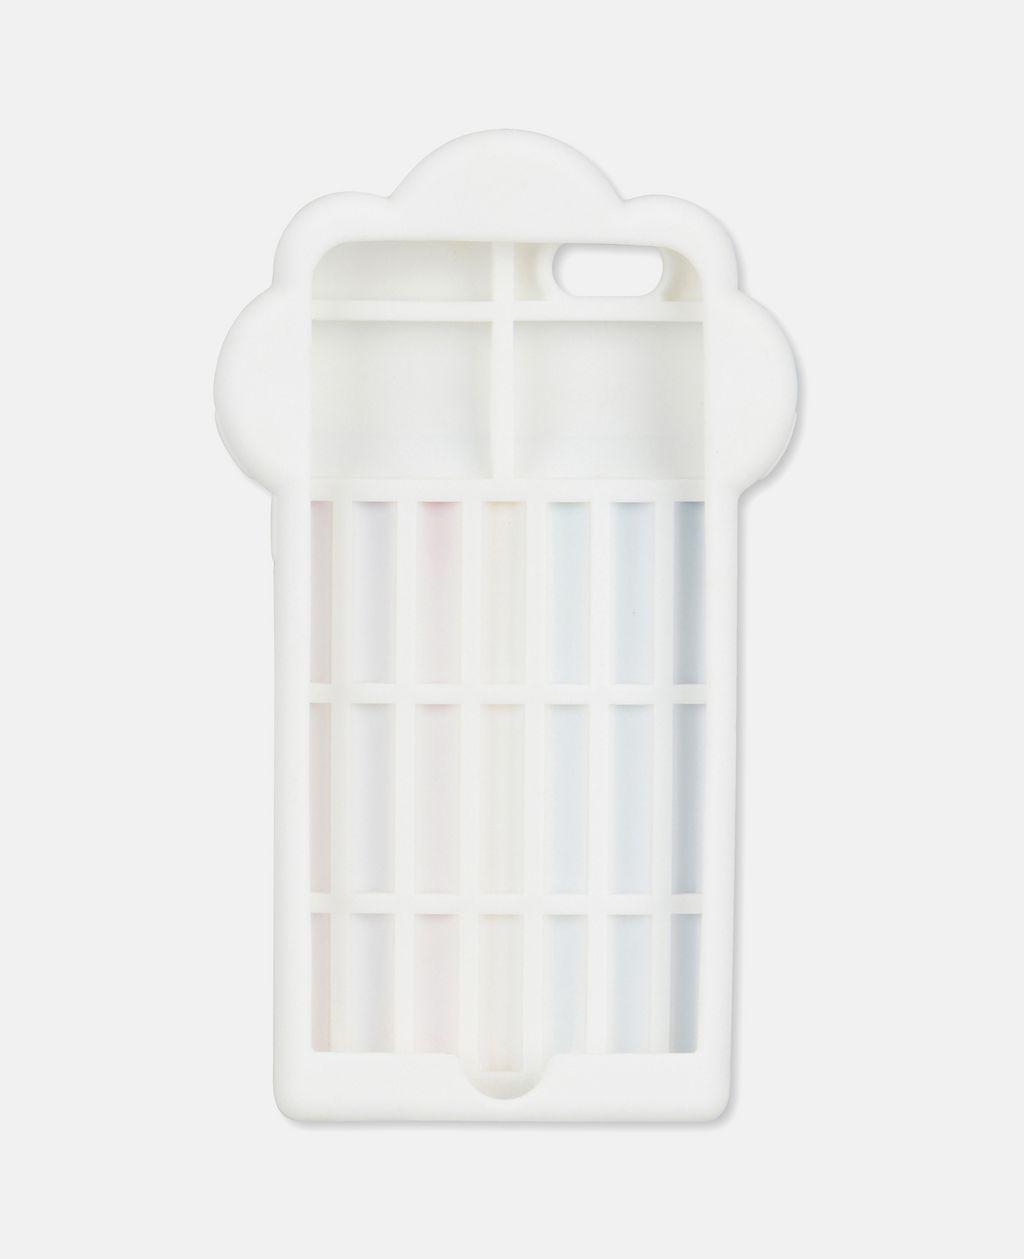 Rainbow iPhone 6 Case - STELLA MCCARTNEY